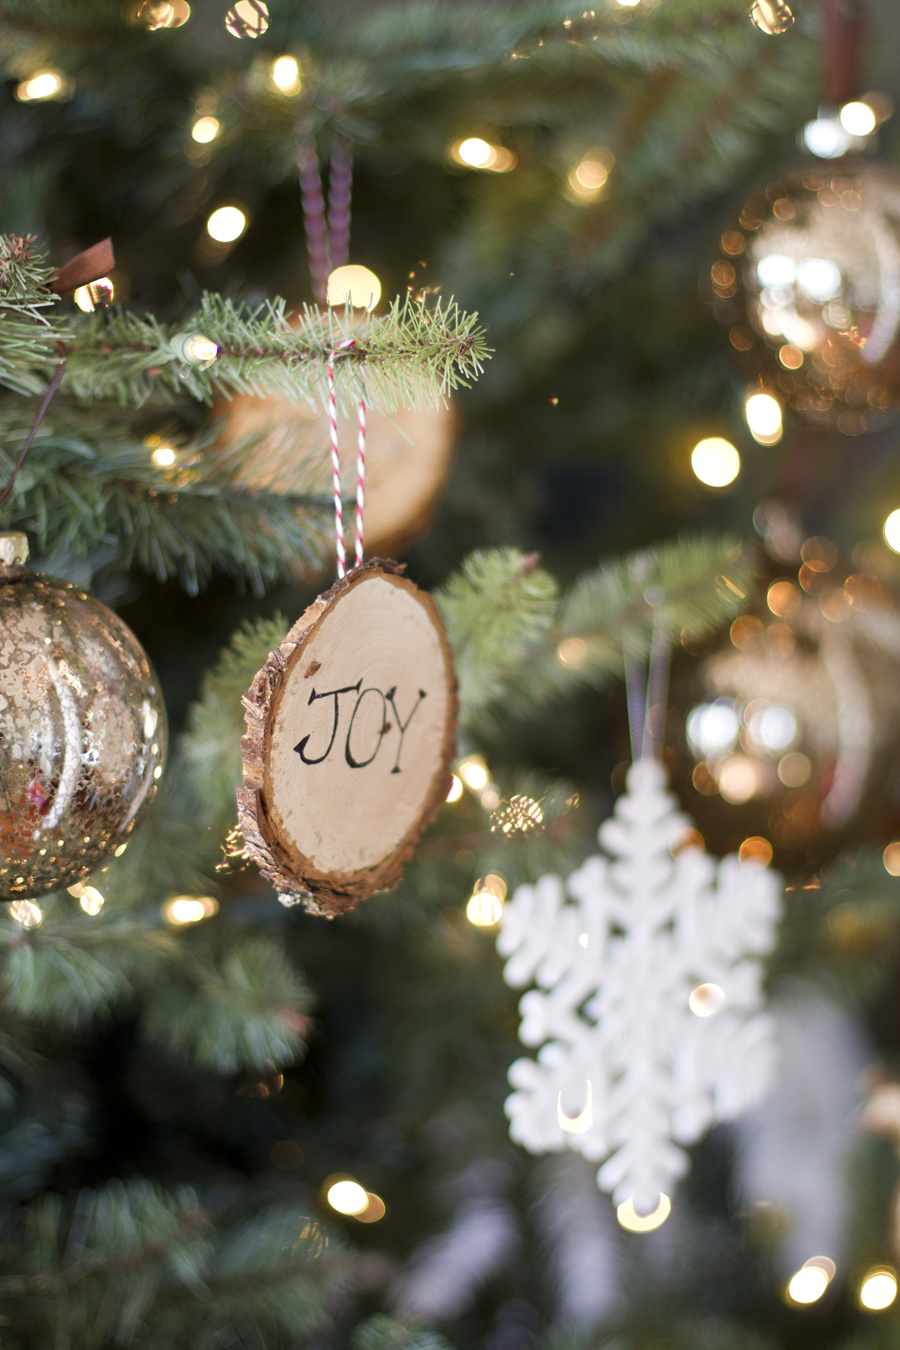 How To Make Wood Slice Ornaments